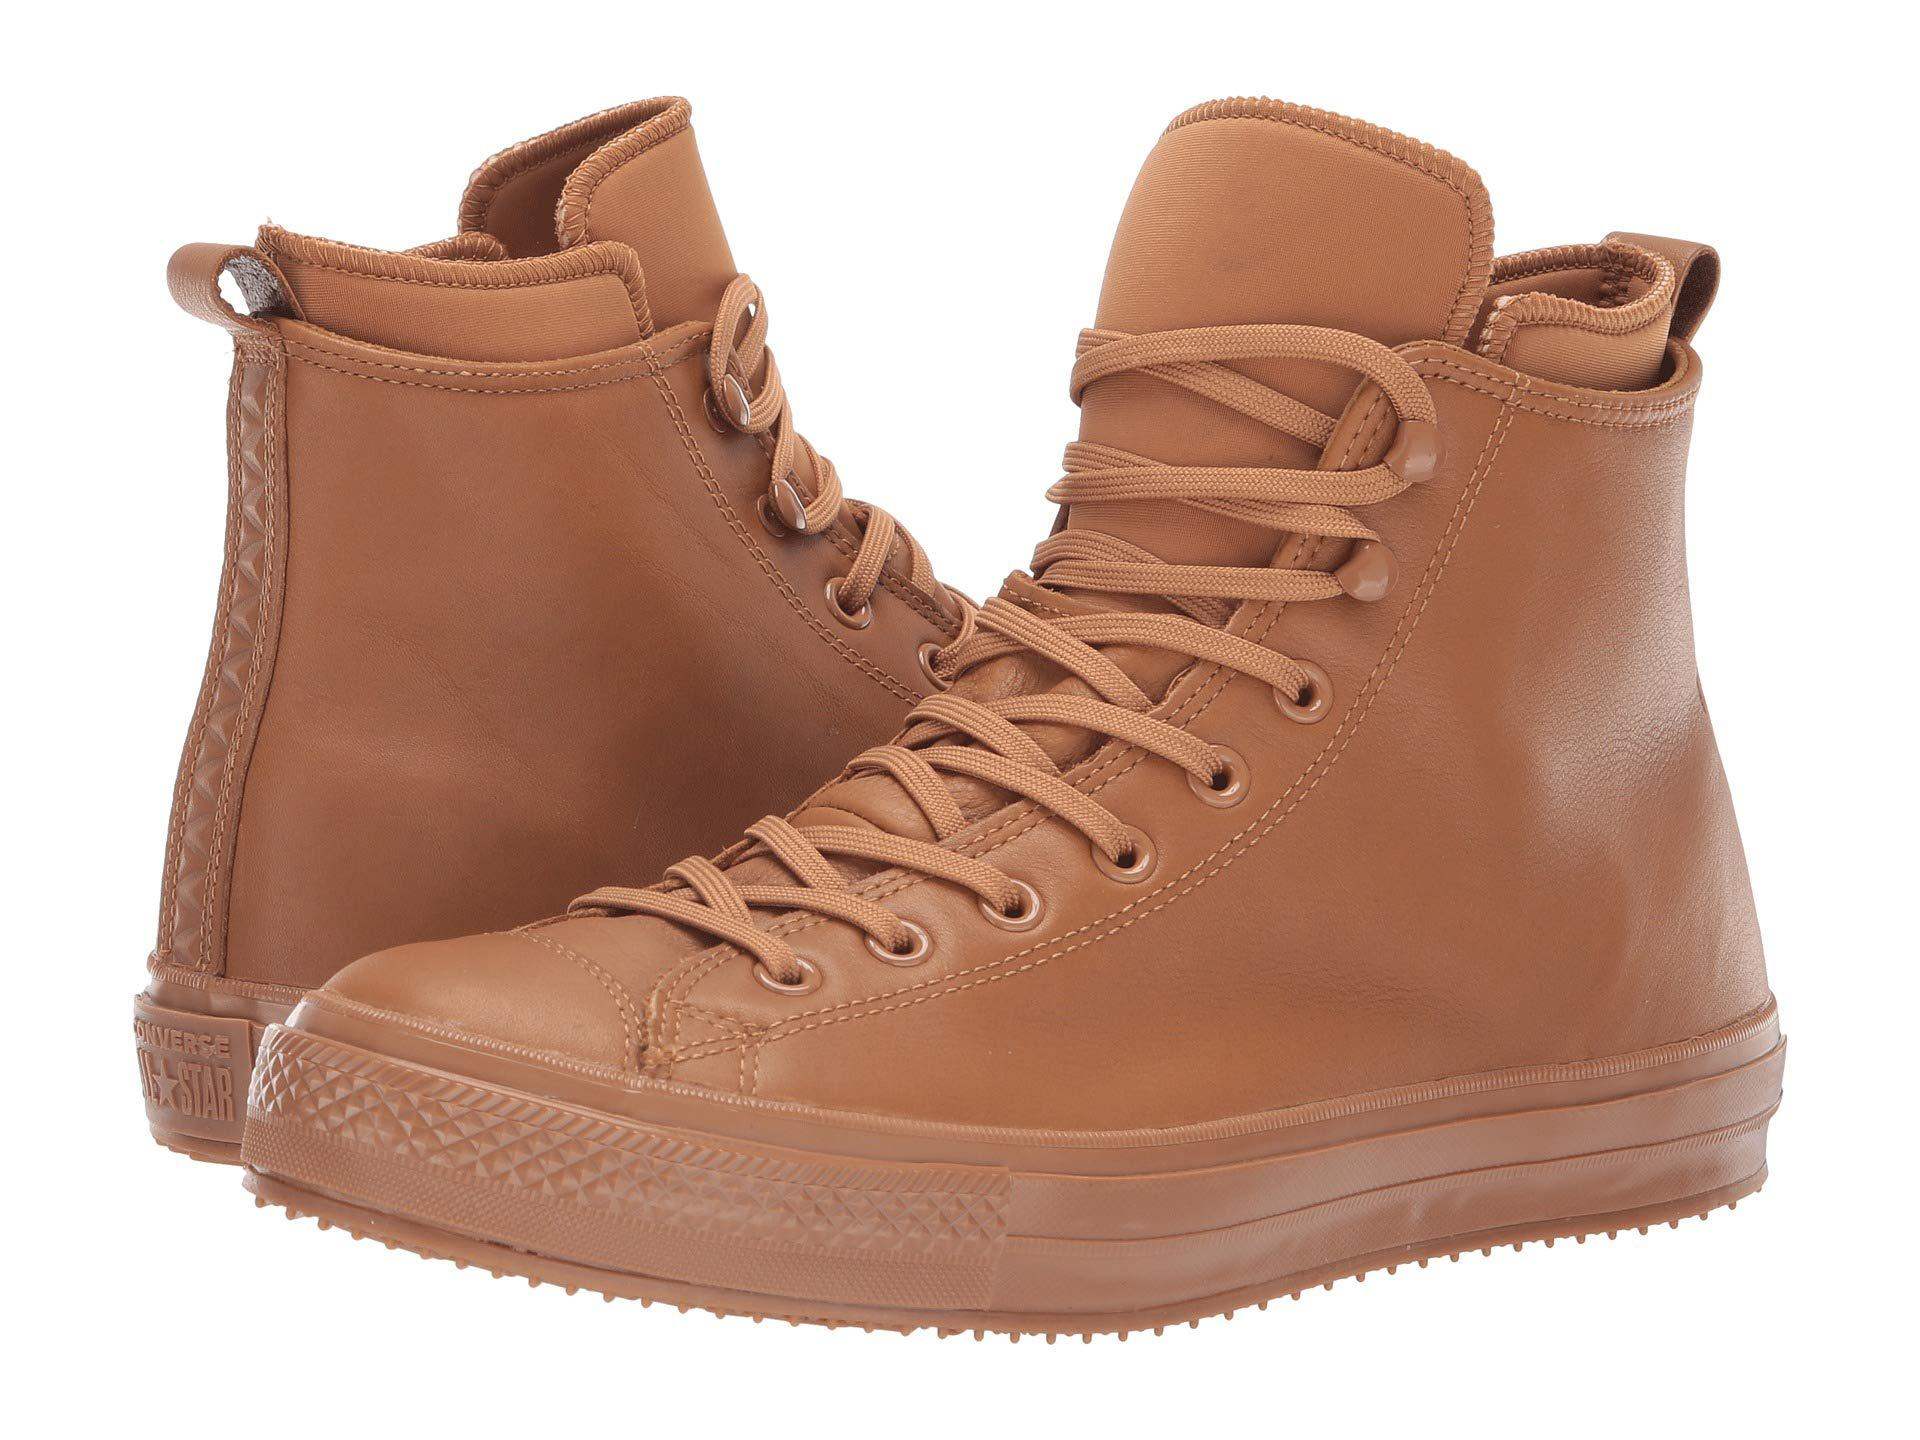 22ec6552cb9e92 Lyst - Converse Chuck Taylor All Star Waterproof Boot - Hi (utility ...